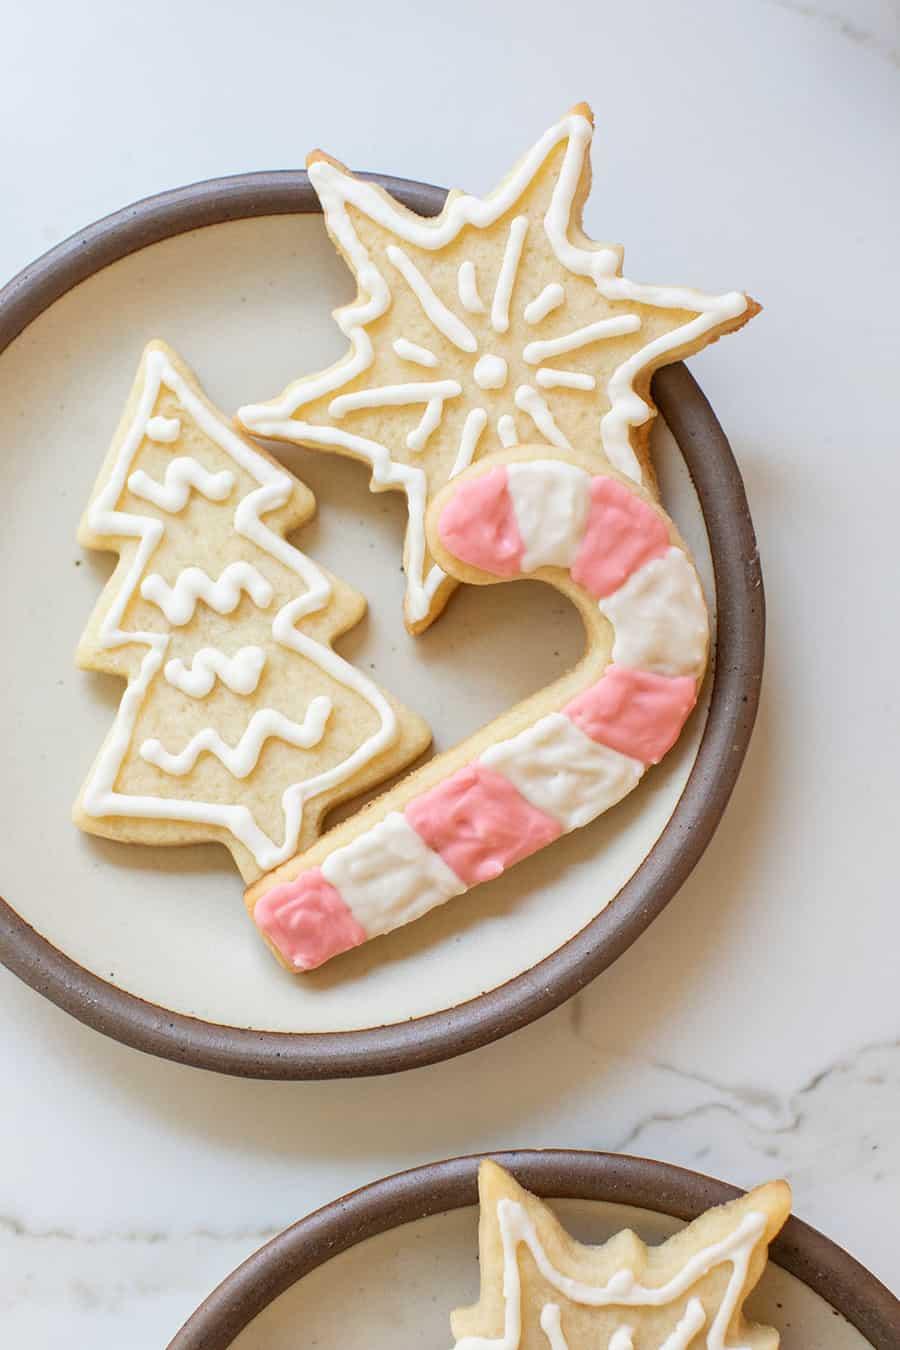 Sugar-free cookies shaped like a candy cane, Christmas tree and snowflake.